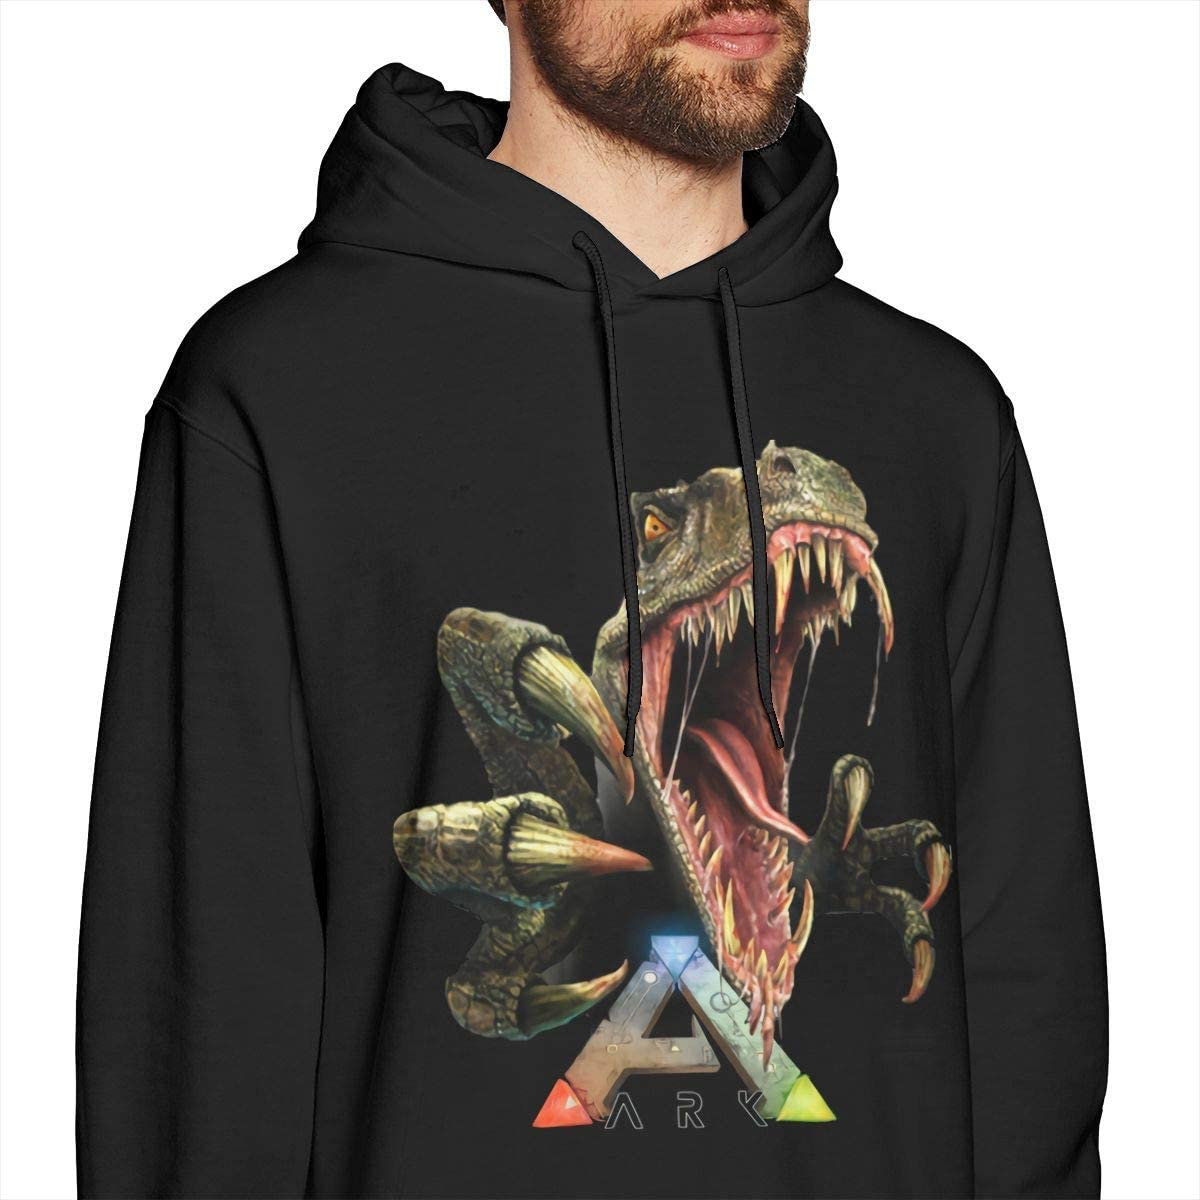 CHICLI Ark Survival Evolved Mens Long Sleeve Sweatshirts Man Hoodies Black